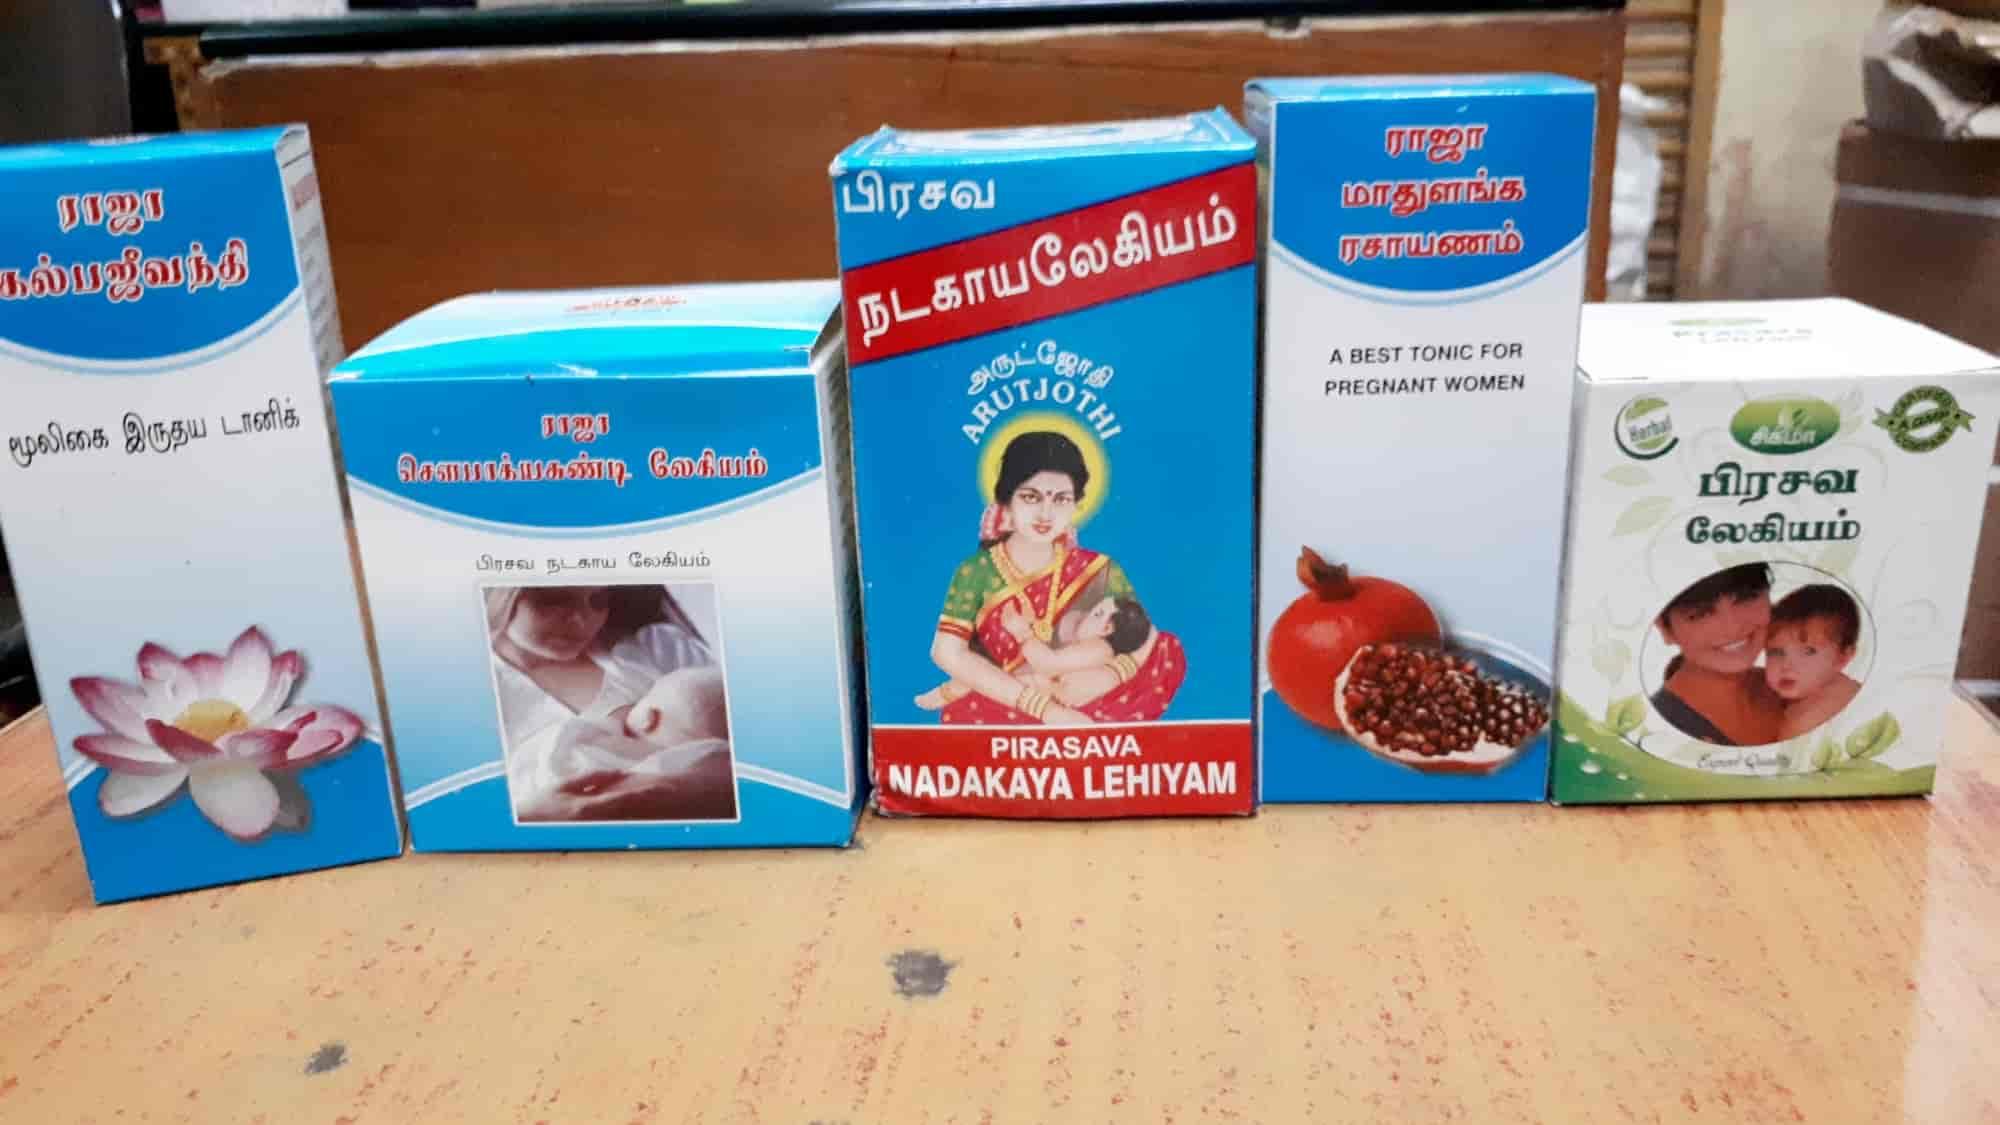 SRSA Agencies, Park Town - Siddha Medicine Distributors in